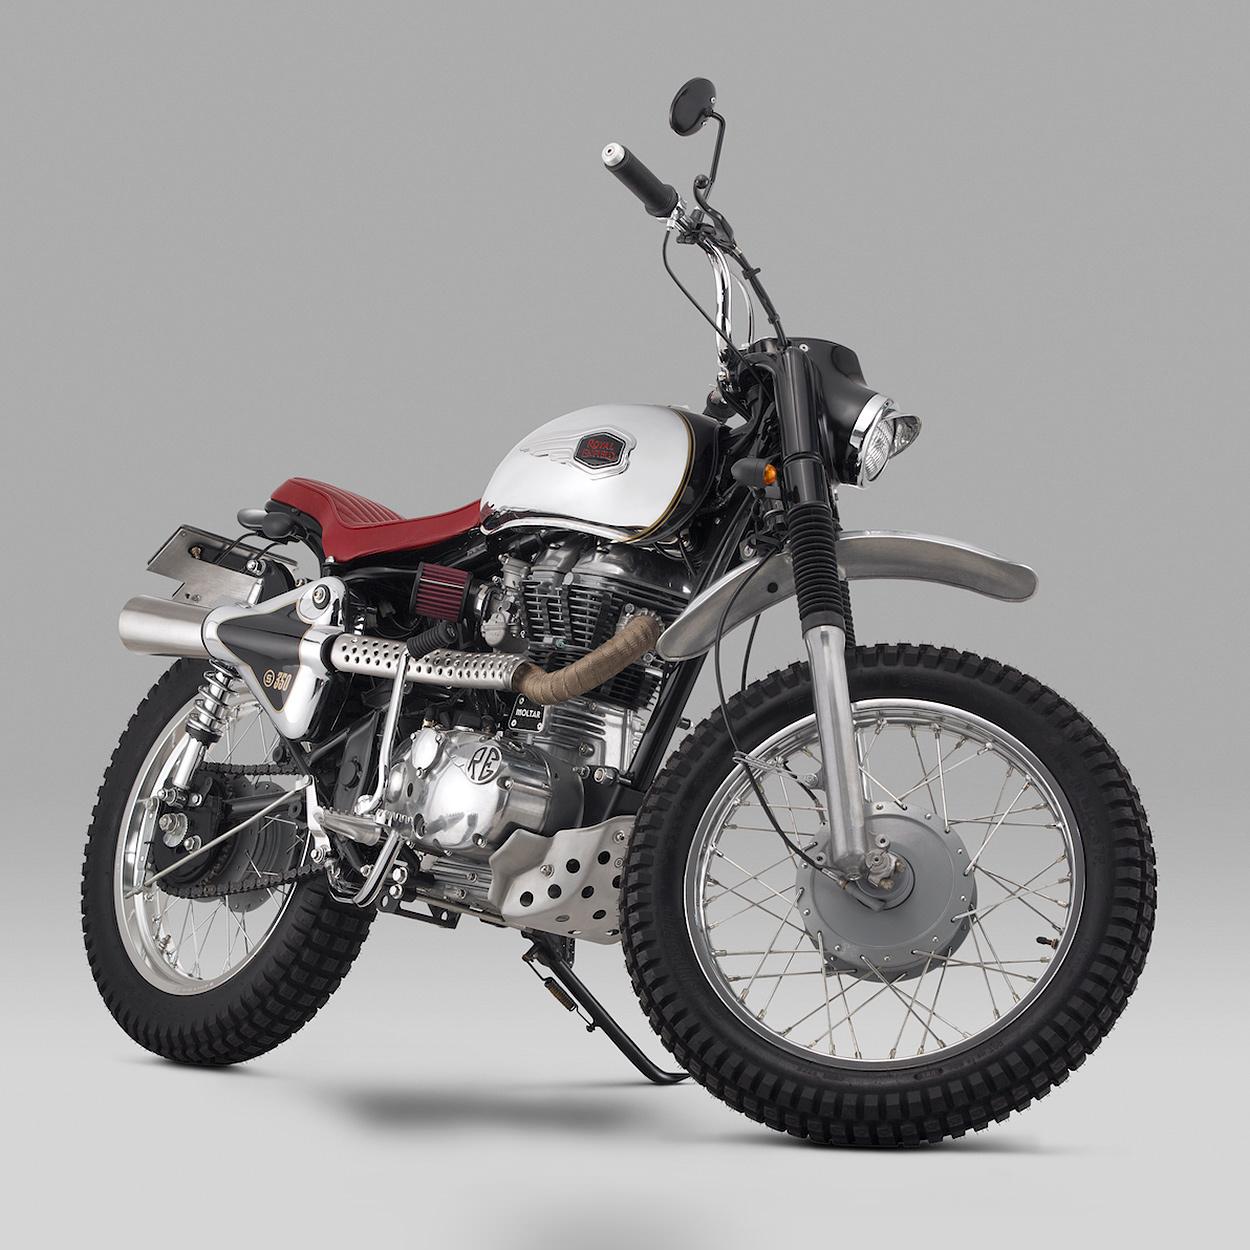 royal enfield customizadas motocultura. Black Bedroom Furniture Sets. Home Design Ideas